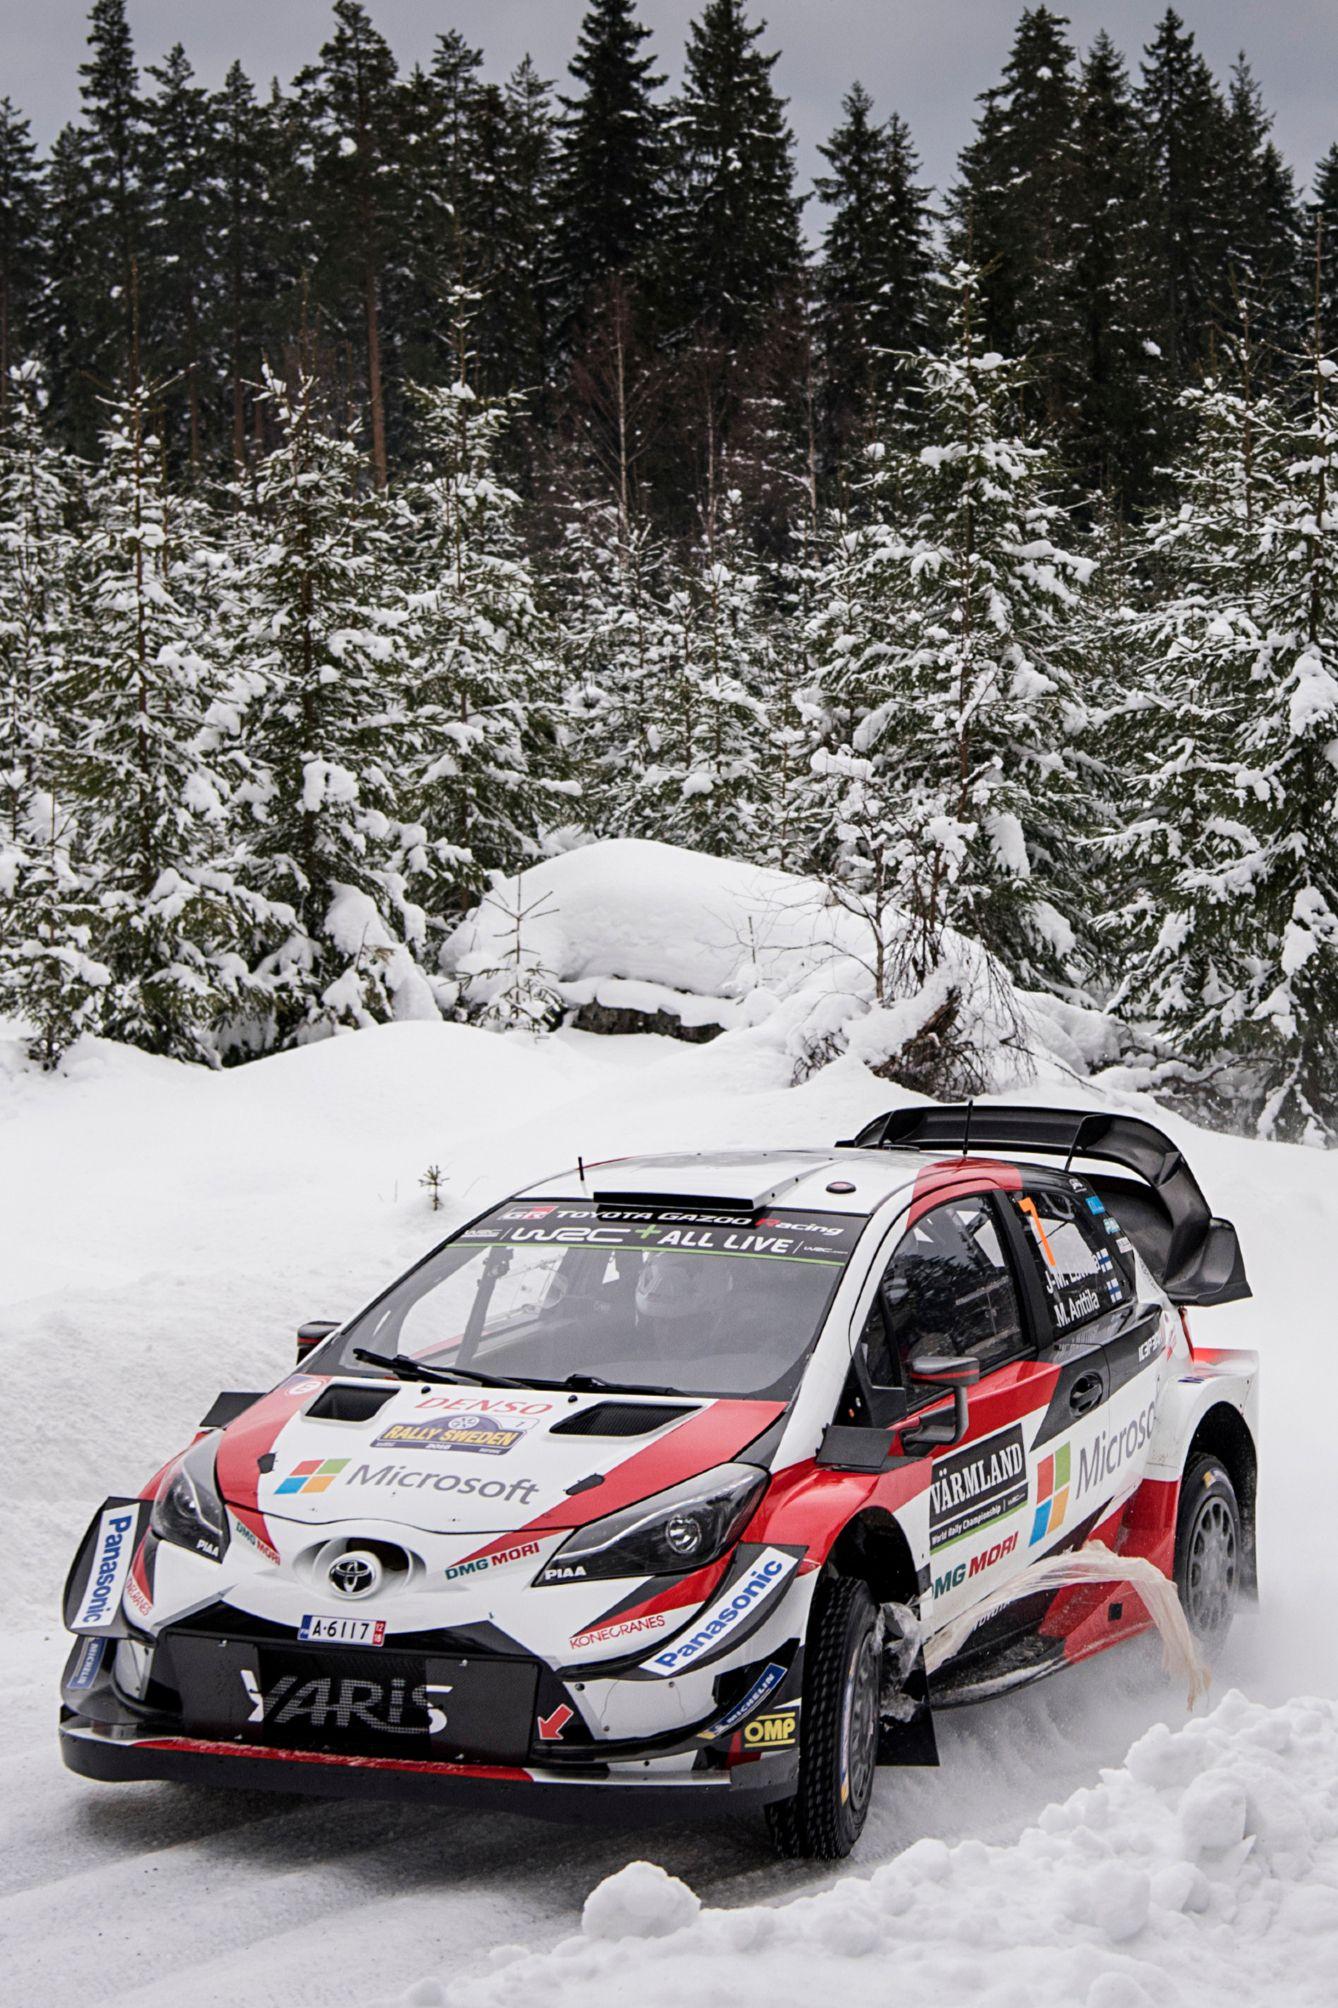 2018 Toyota Yaris Wrc Rally Car Rally Car Racing Rally Drivers